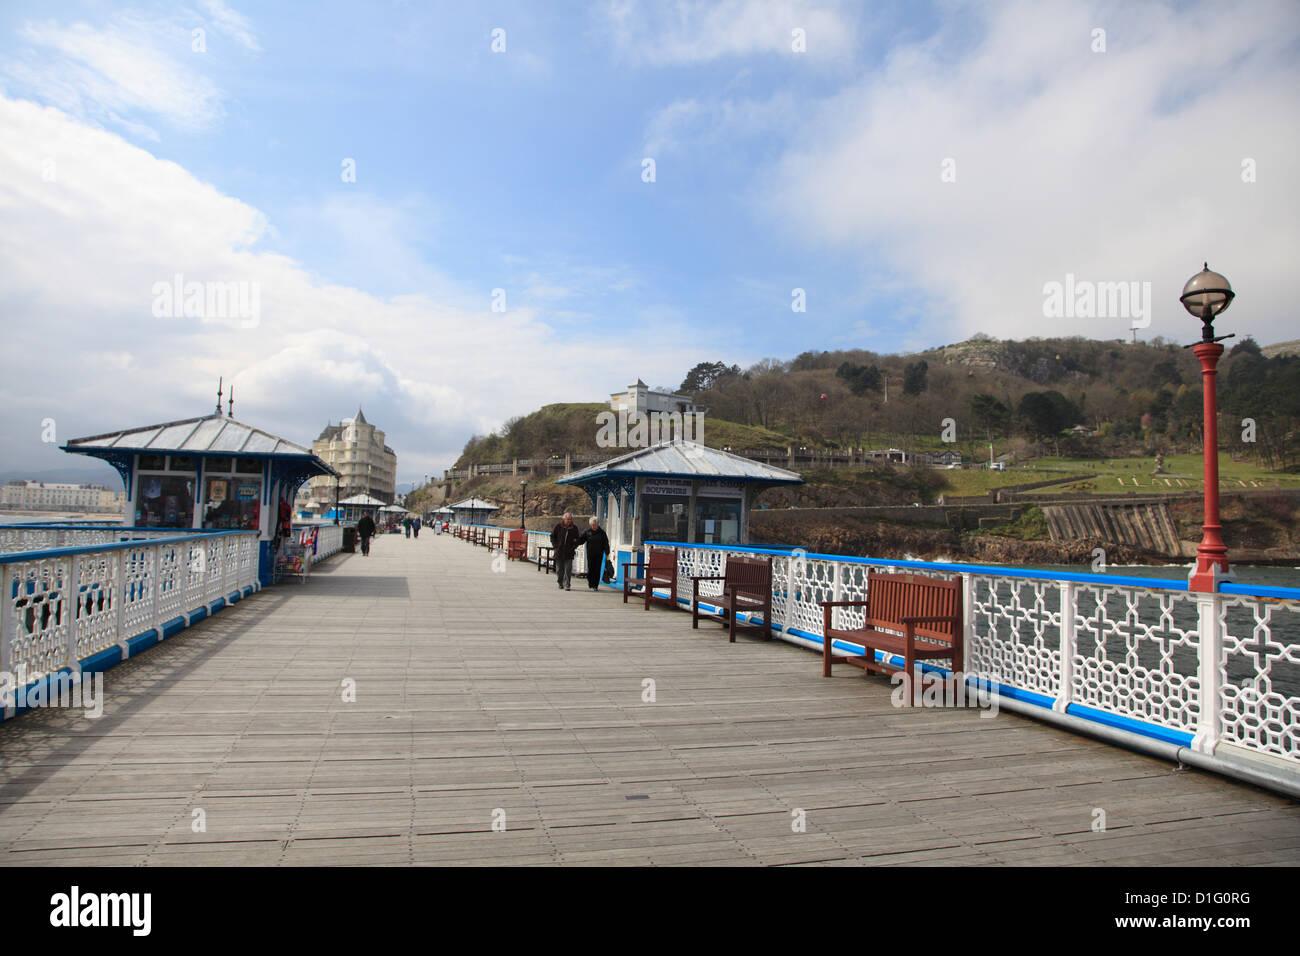 The Pier, Llandudno, Conwy County, North Wales, Wales, United Kingdom, Europe Stock Photo